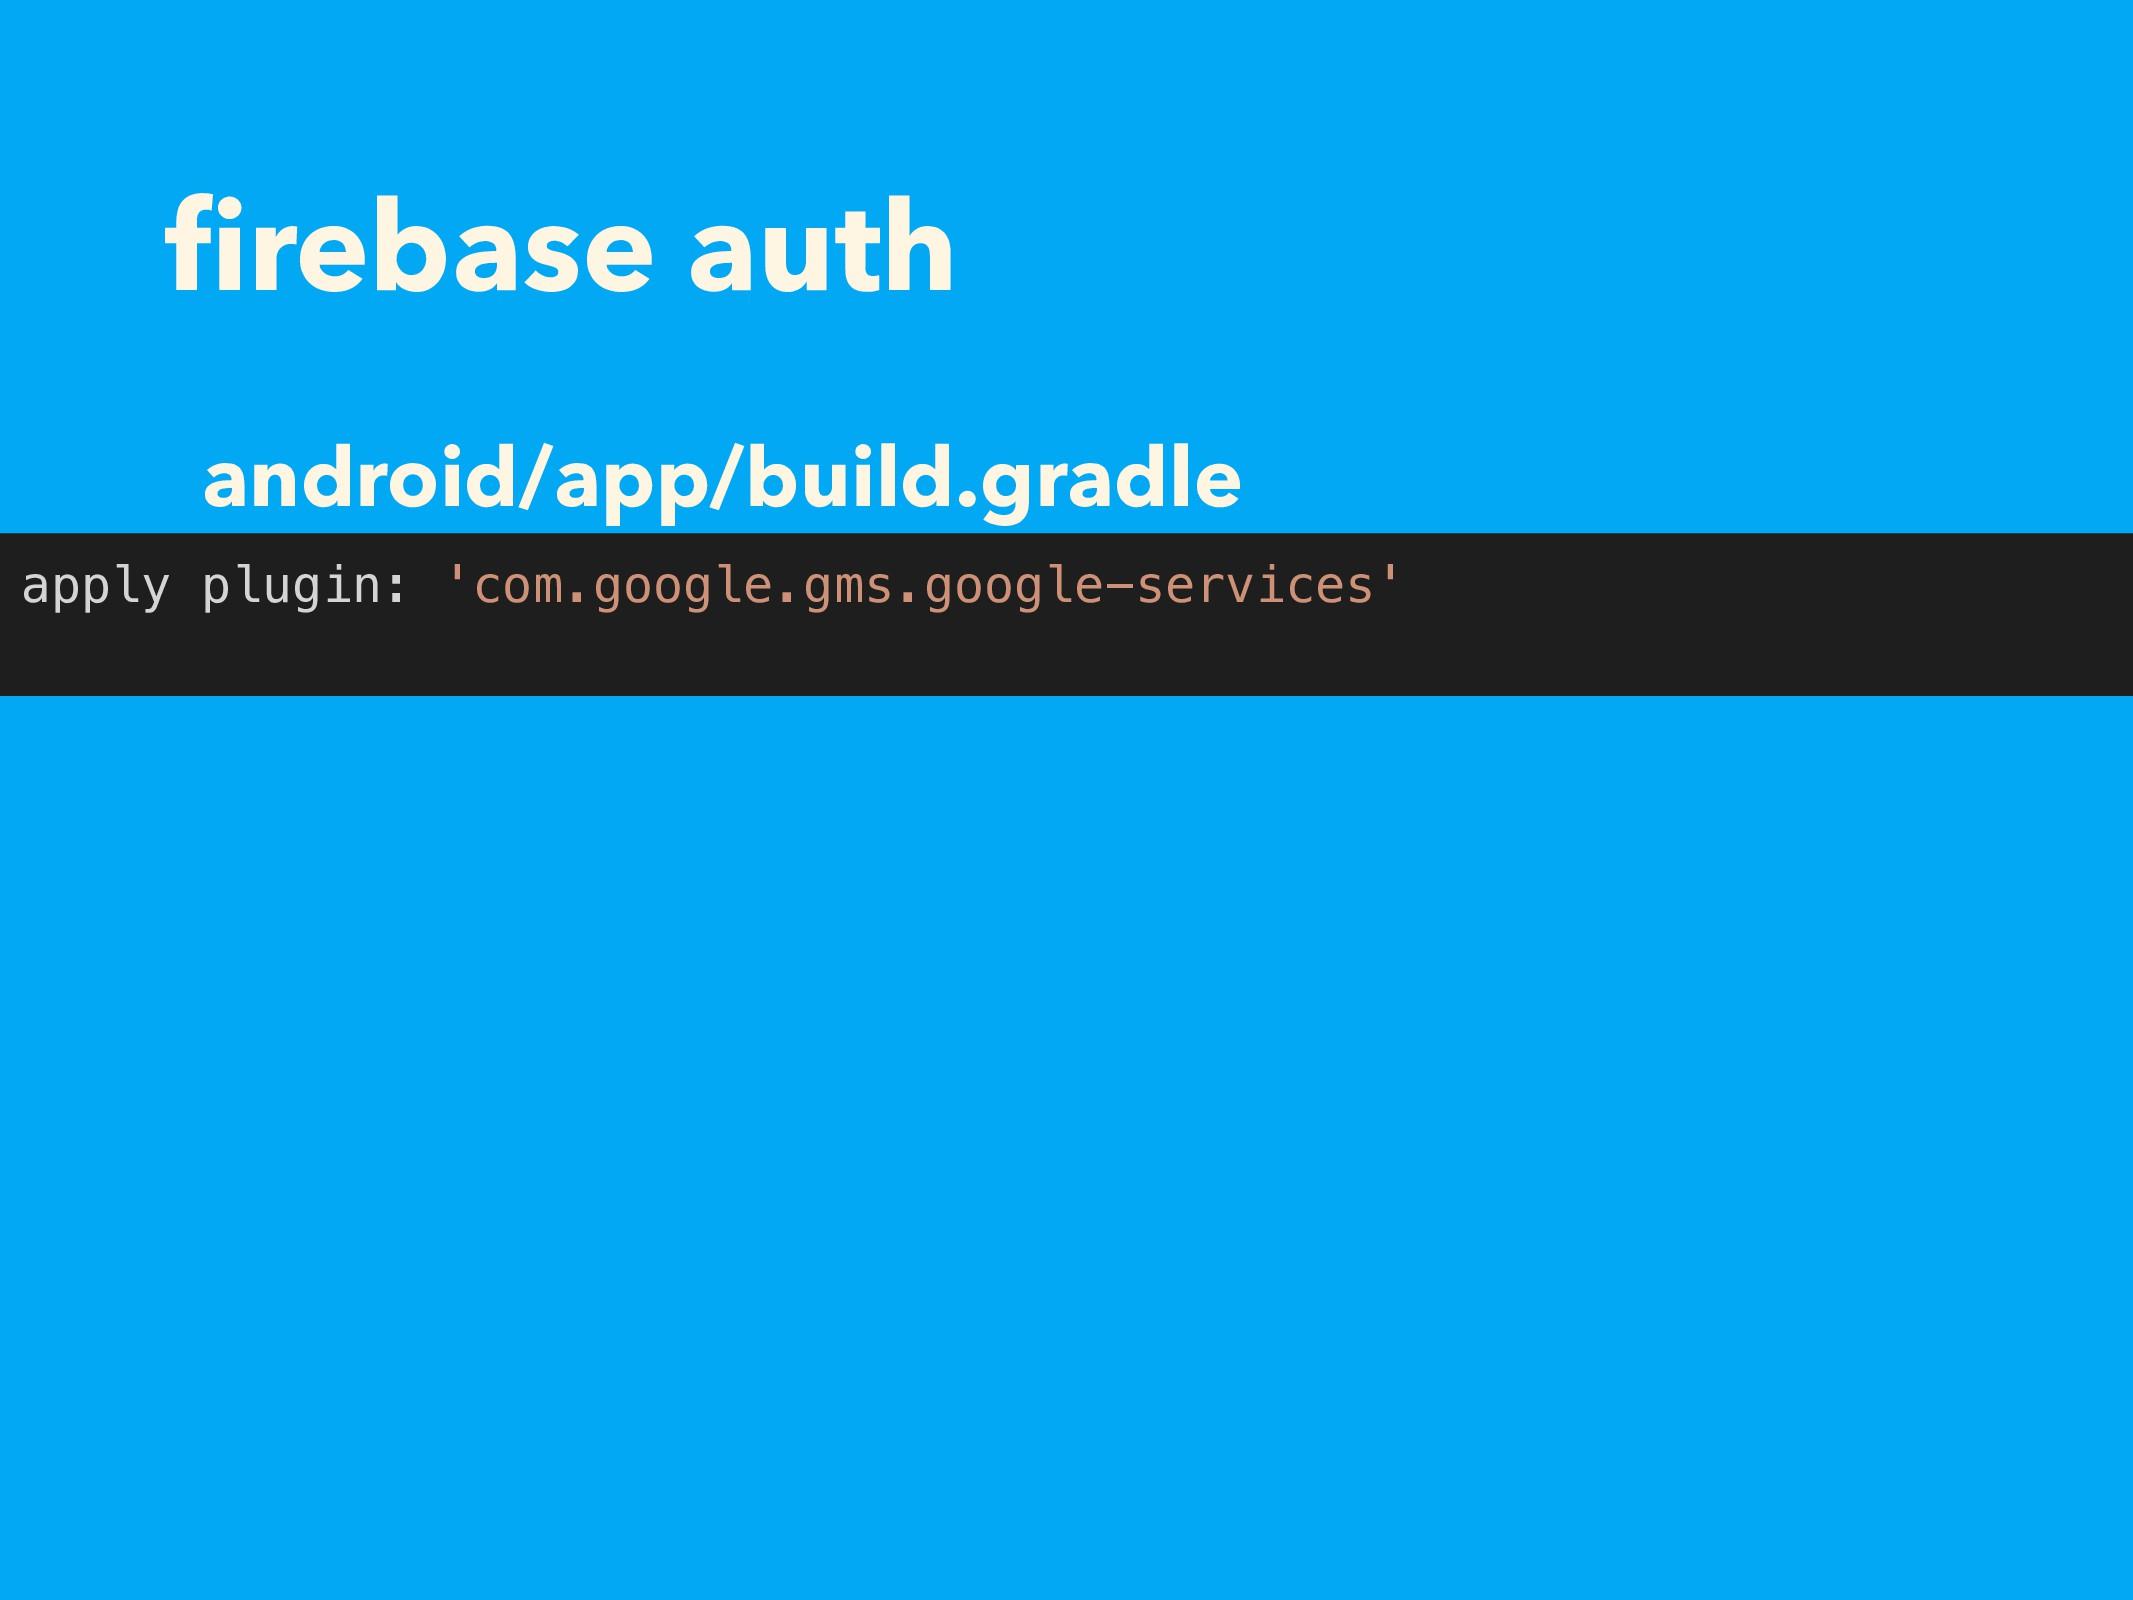 firebase auth apply plugin: 'com.google.gms.goog...